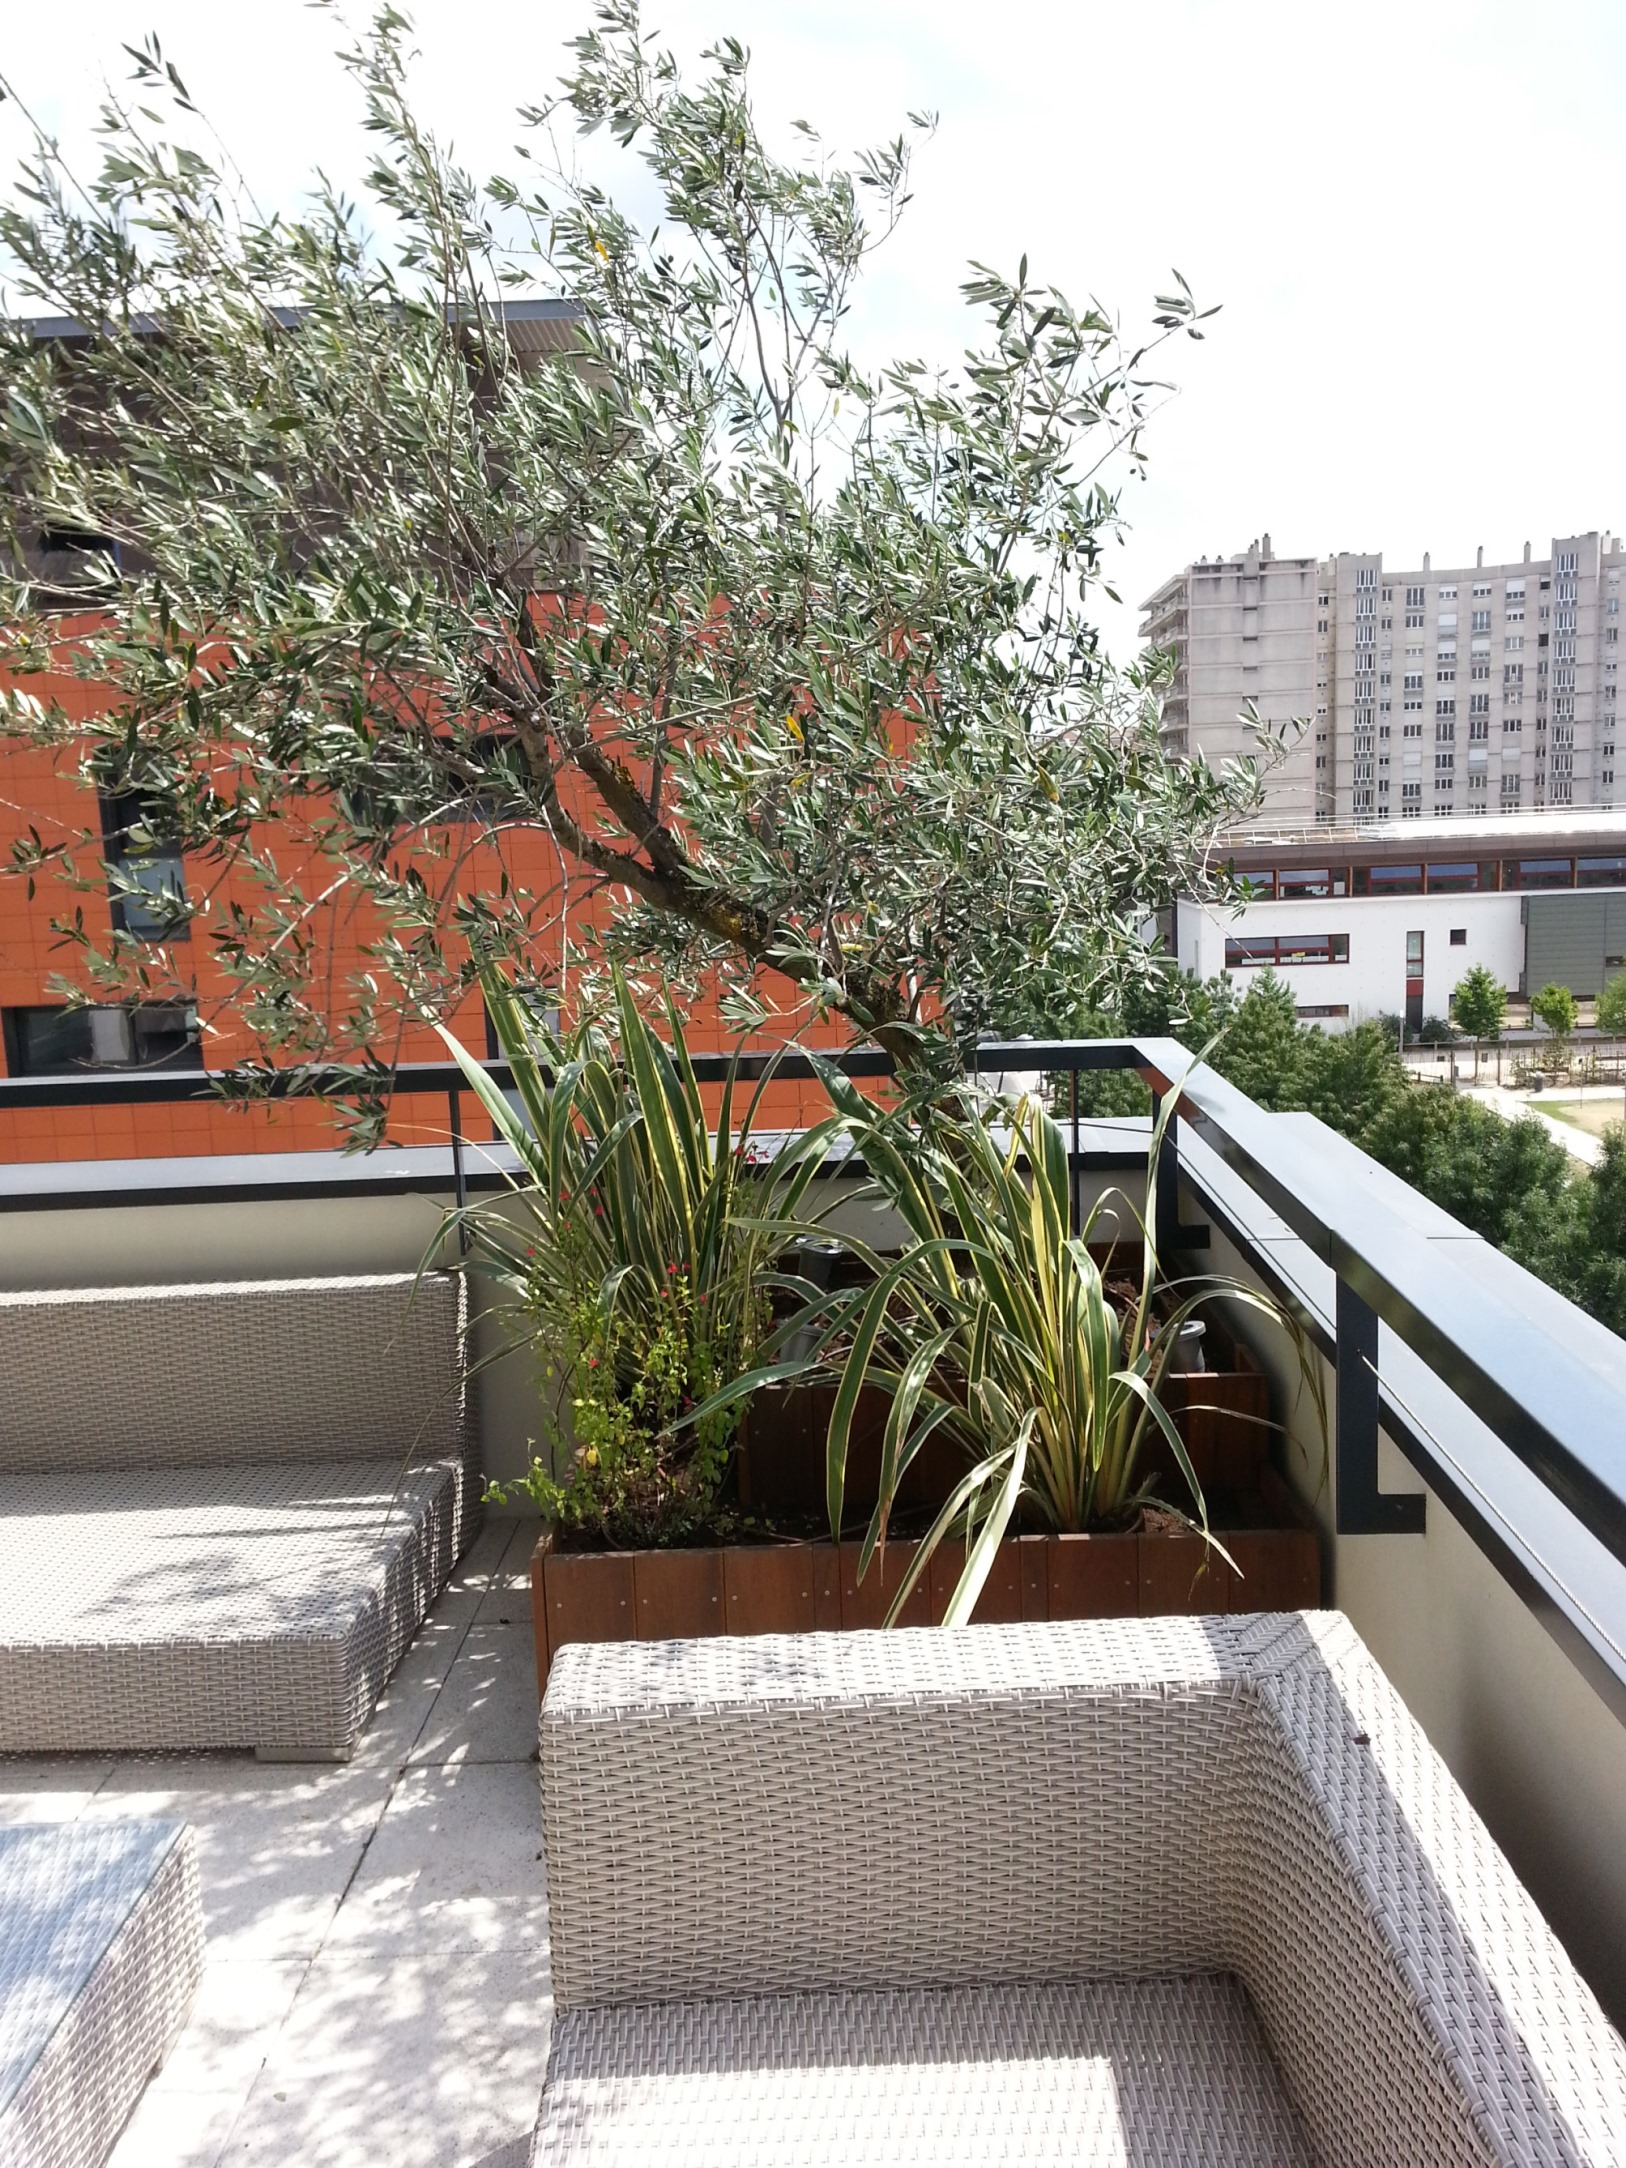 jour de jardin paysagiste lyon balcons. Black Bedroom Furniture Sets. Home Design Ideas